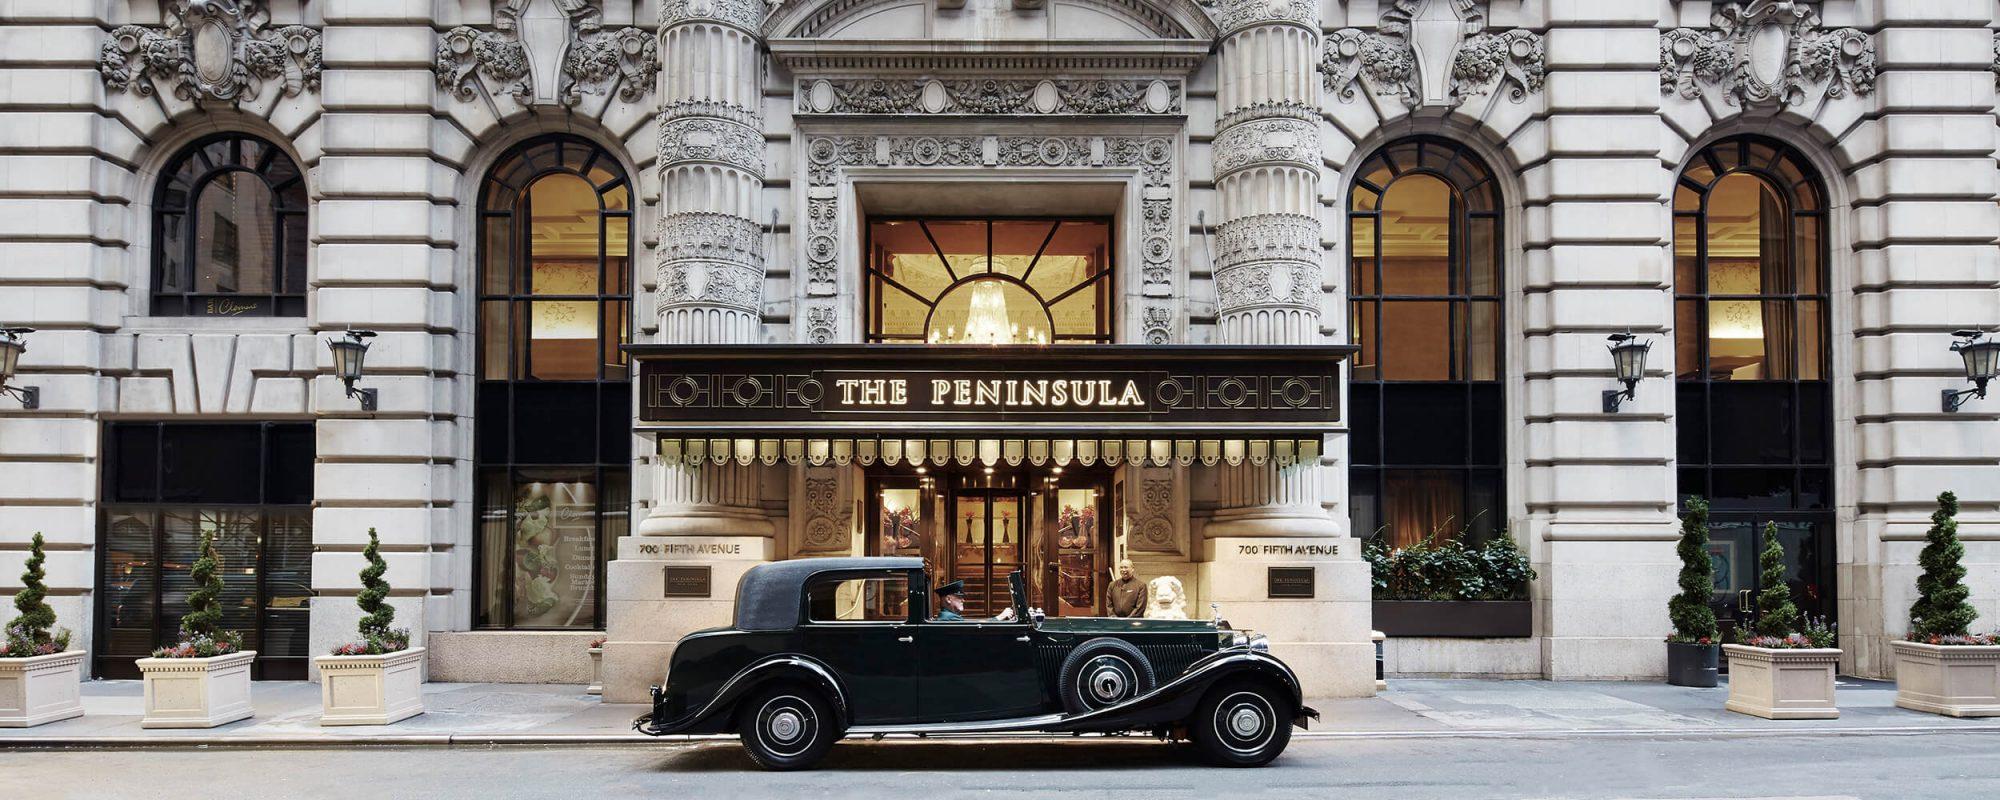 Peninsula entrance